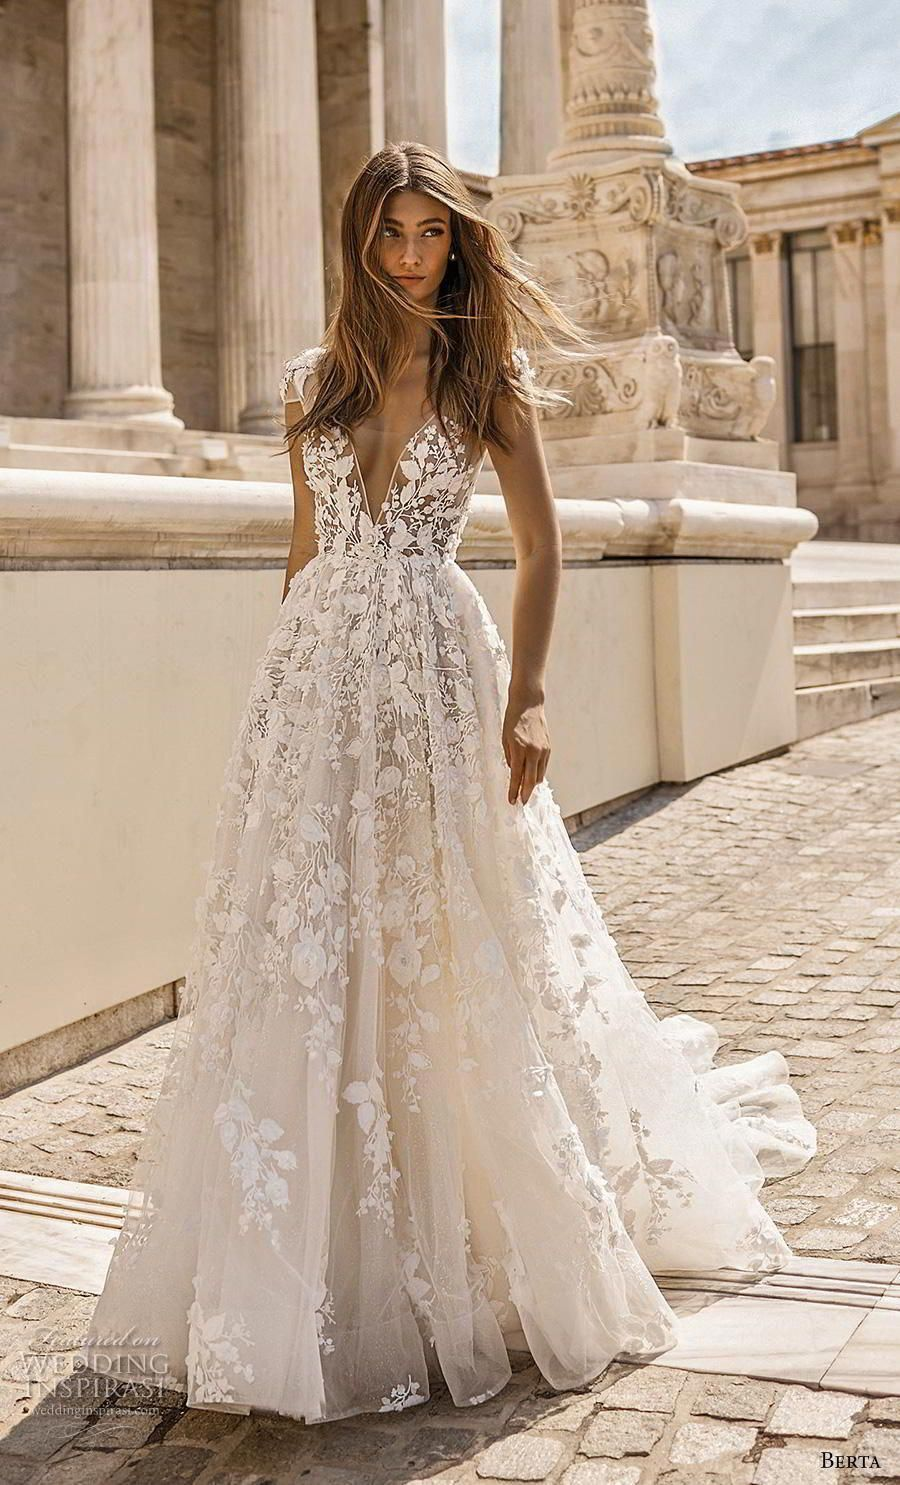 Pin on Sweetheart wedding dresses